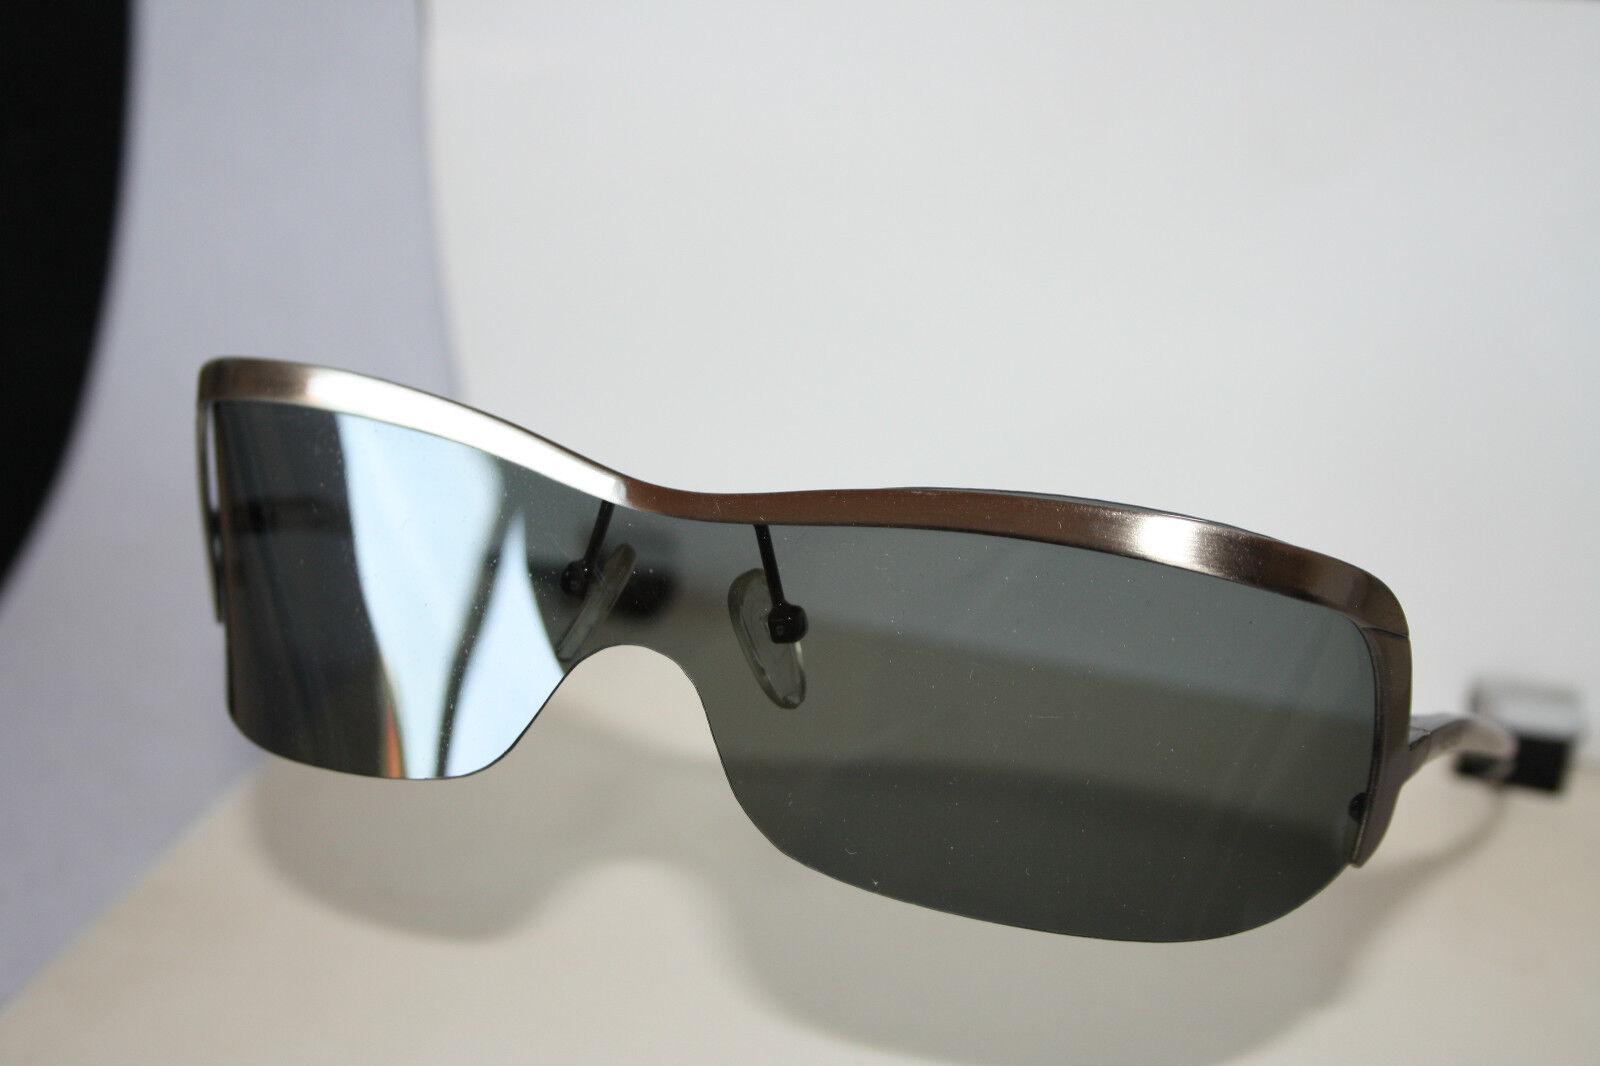 Revex Unisex Sonnenbrille POL-304 cat.3 Made Made Made in USA polar. Lunettes Sunglasses   Auf Verkauf  36d8f8